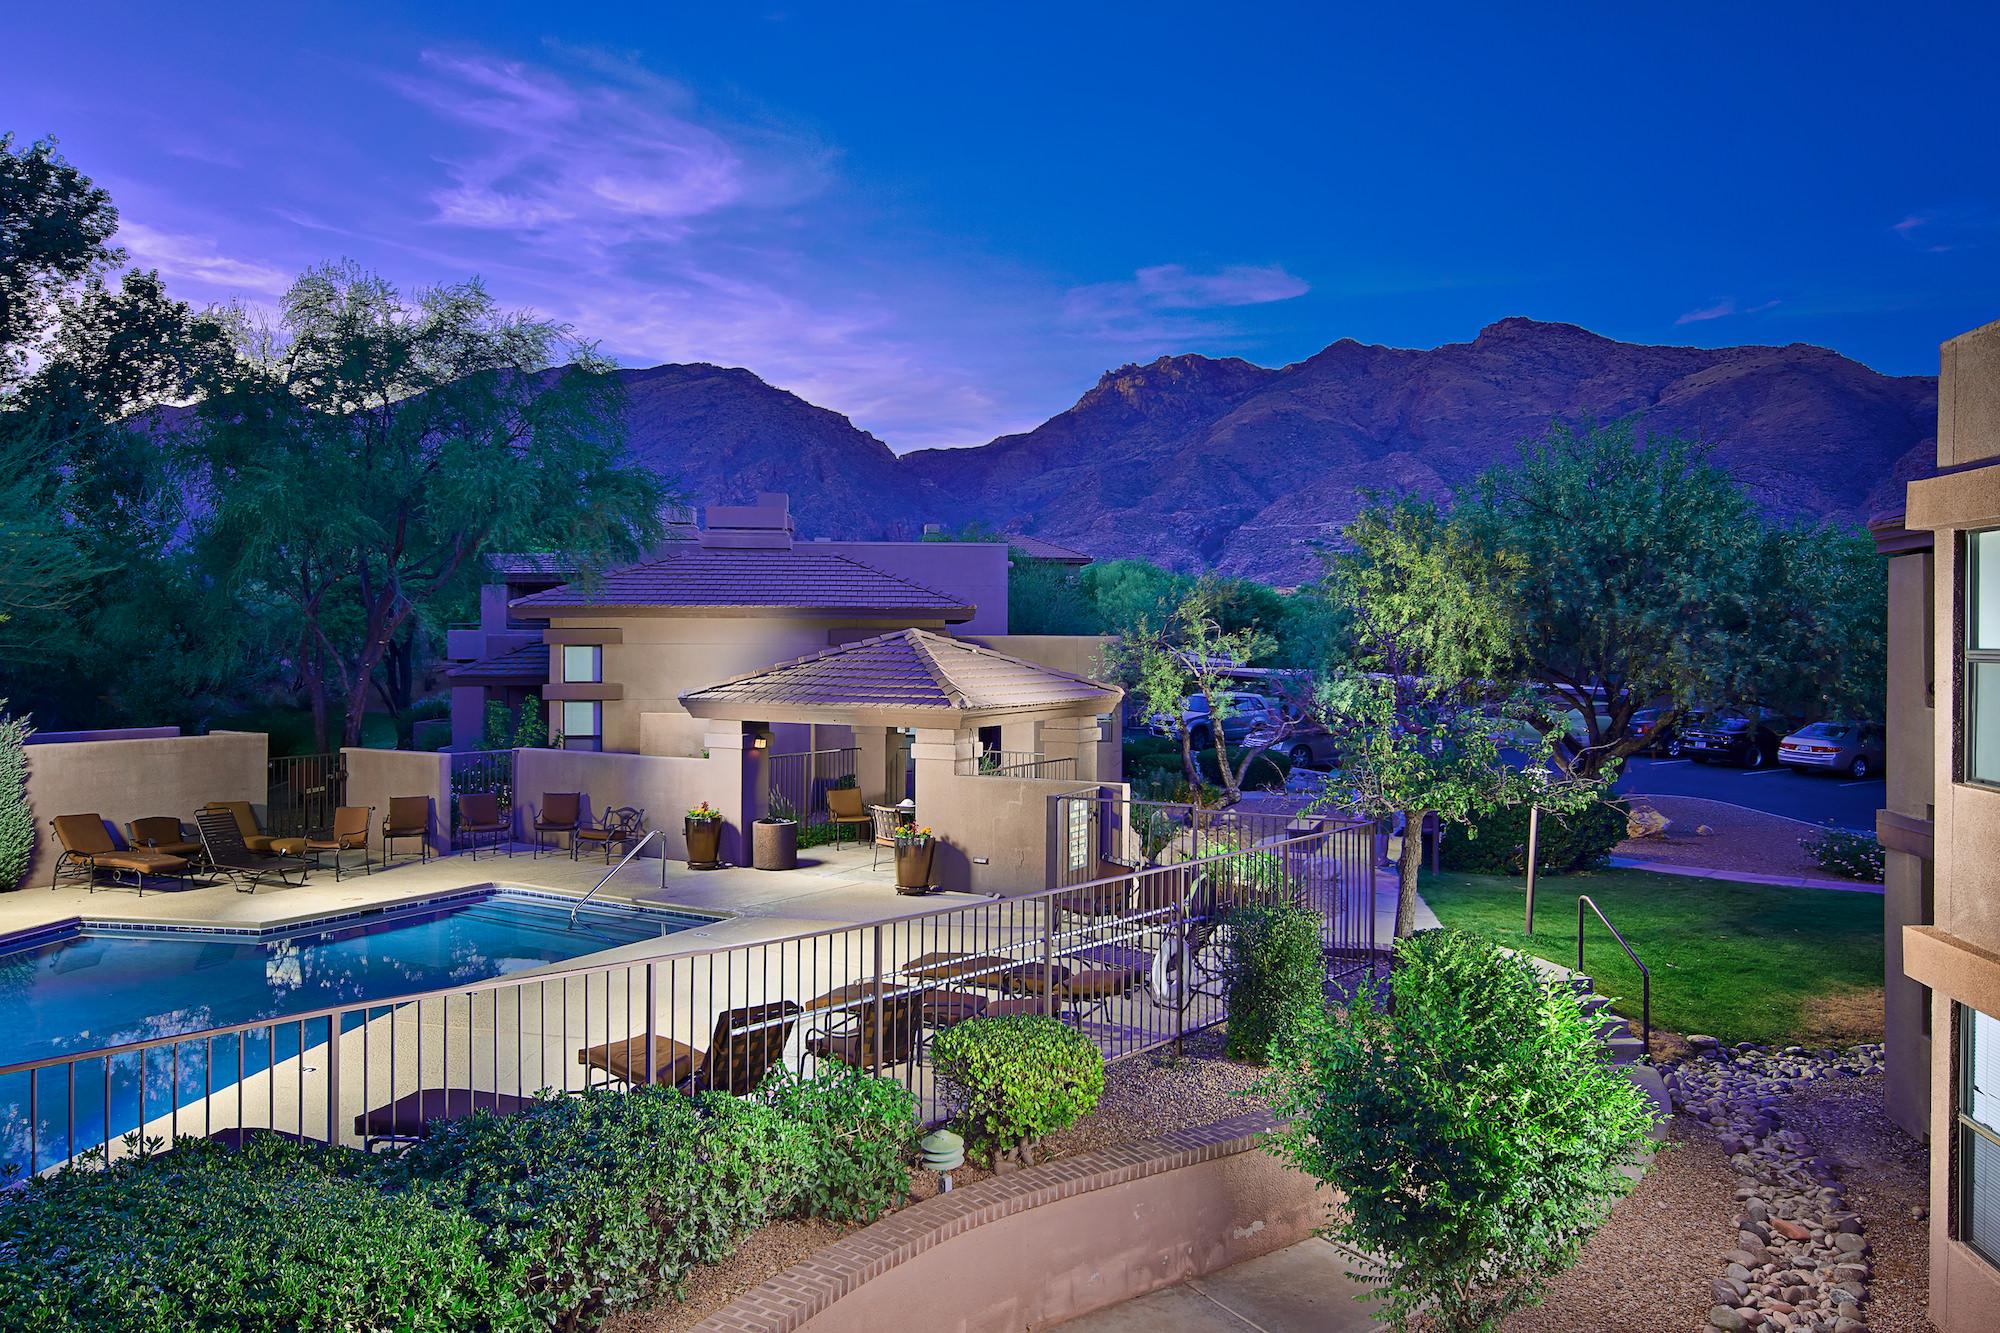 The Greens at Ventana Canyon | 5800 North Kolb Road, Tucson AZ 85750 | 54 of 265 Units | Built in 1986 | Renovated: 2006 | $4,992,000 | $92,444 Per Unit | $88.45 Per SF